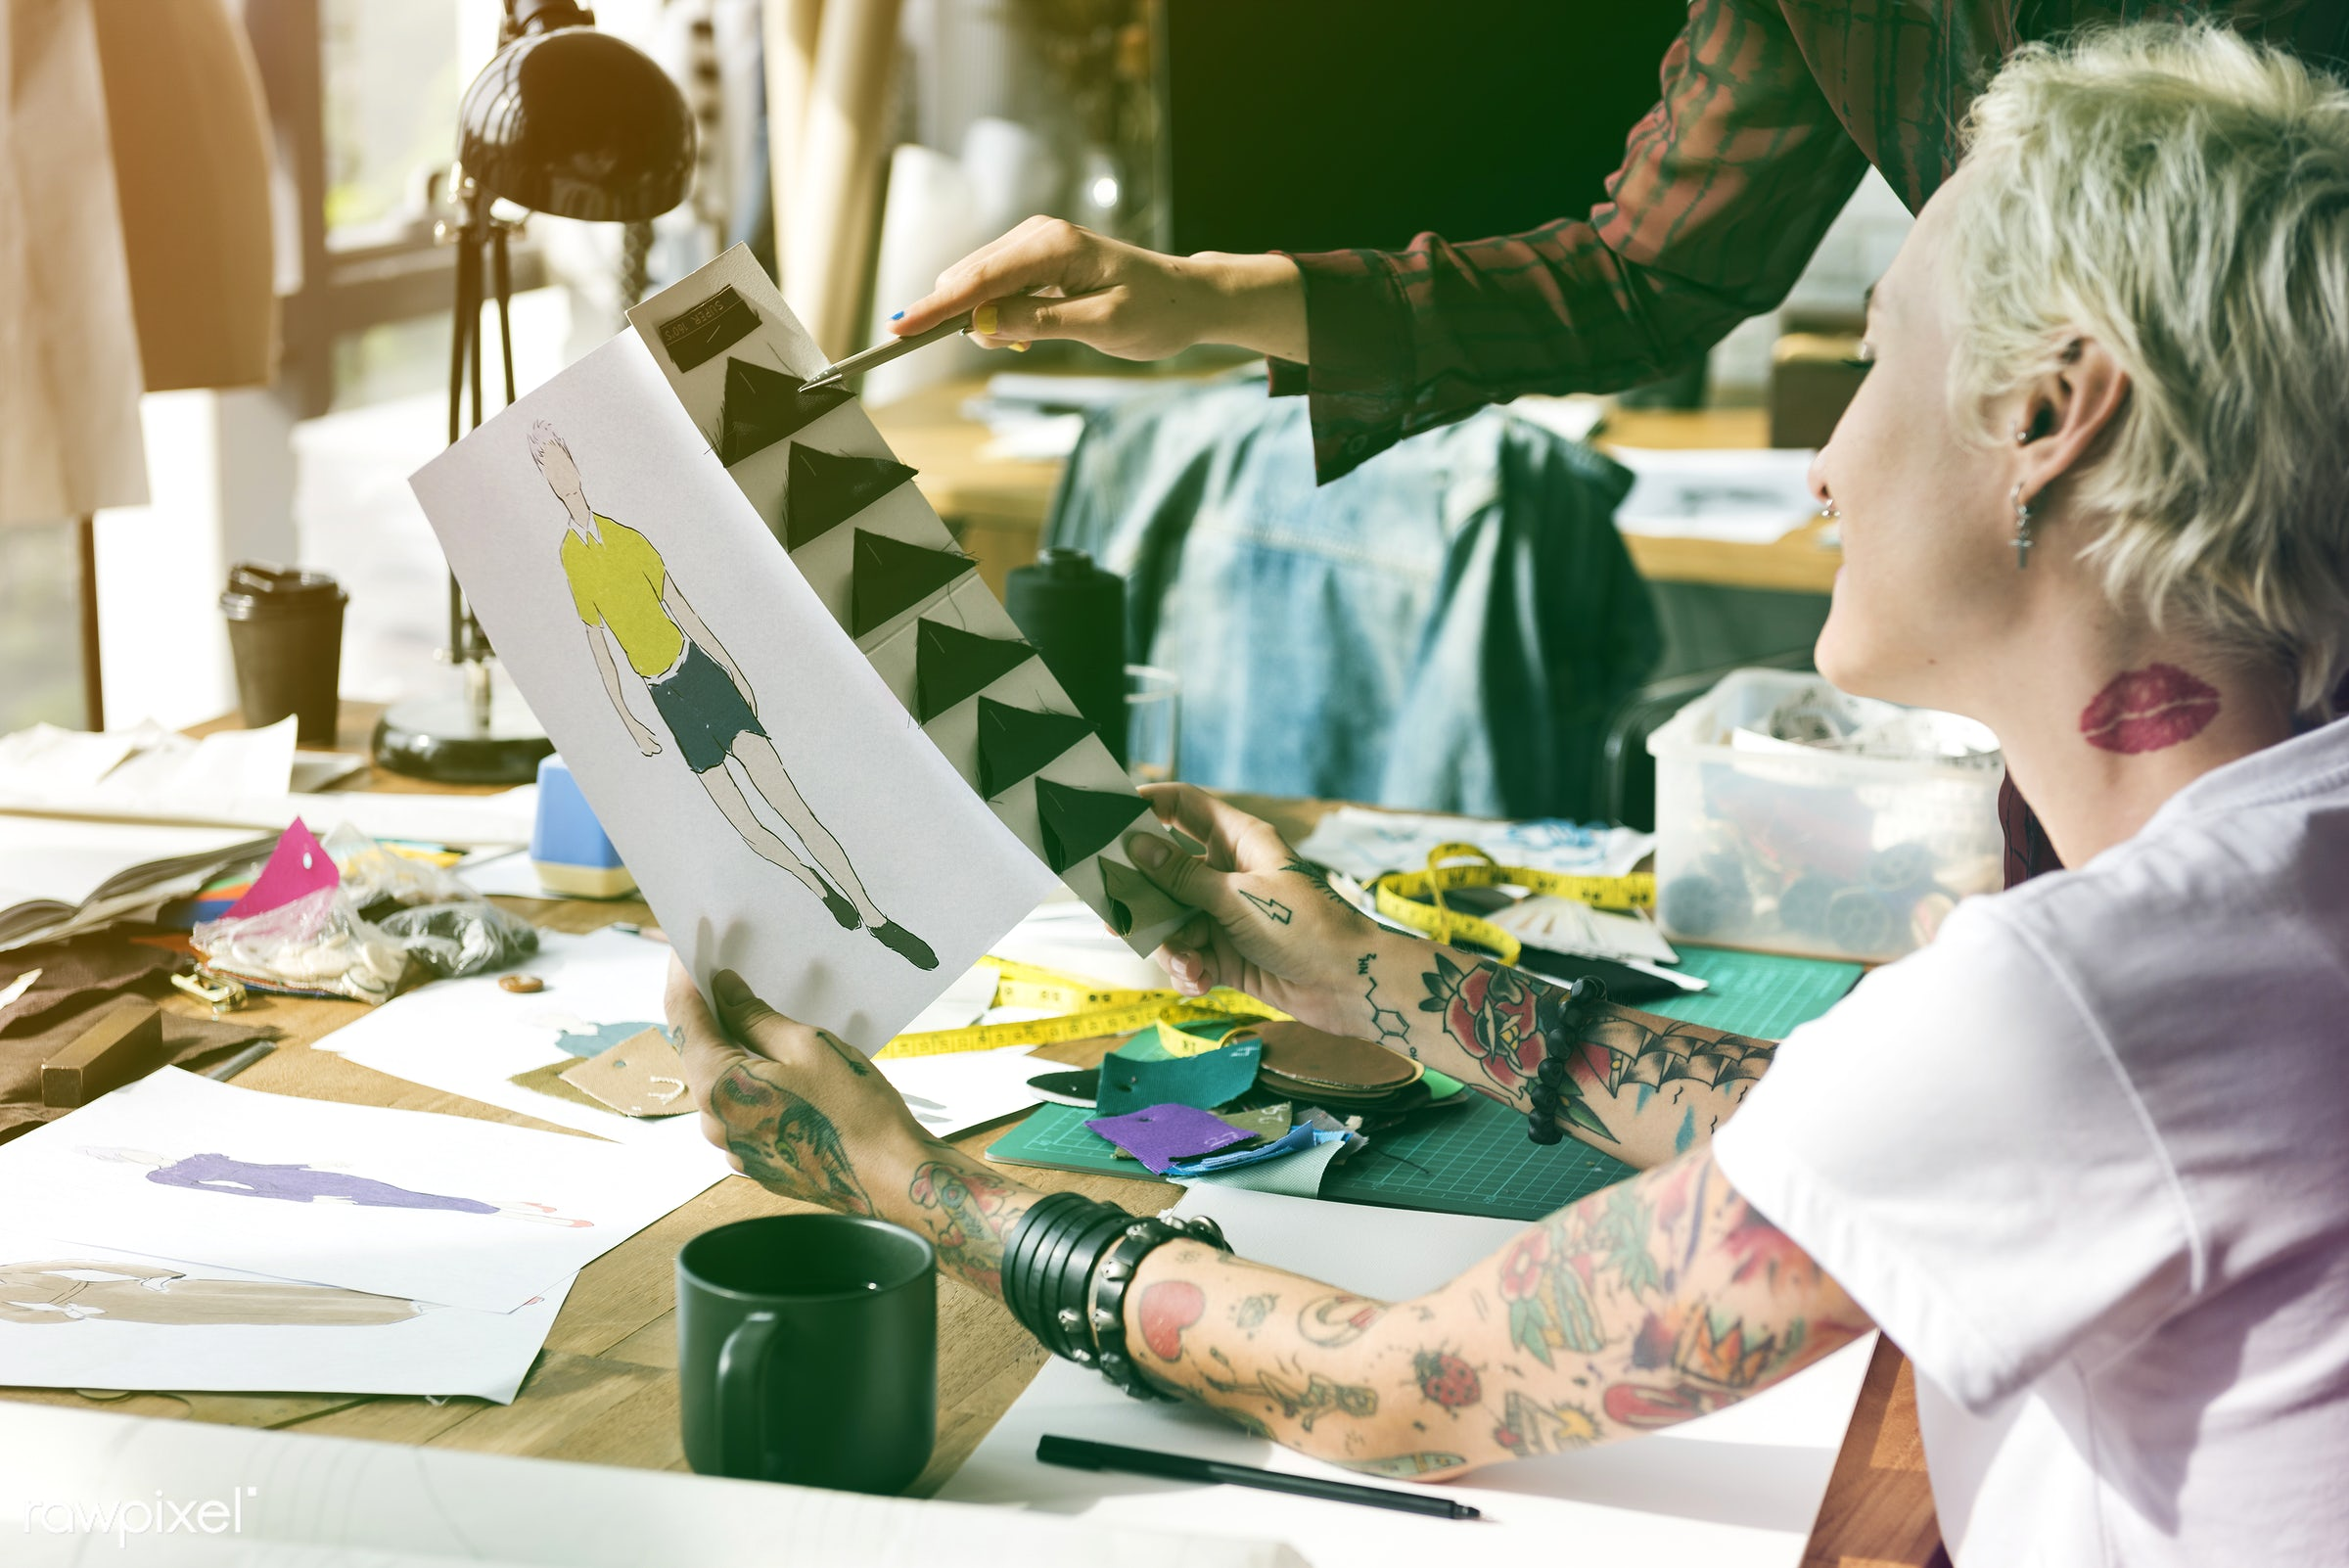 designing, dressmaker, selecting, inspiration, materials, threads, choosing, tattoo, choose, work, creative, clothes,...